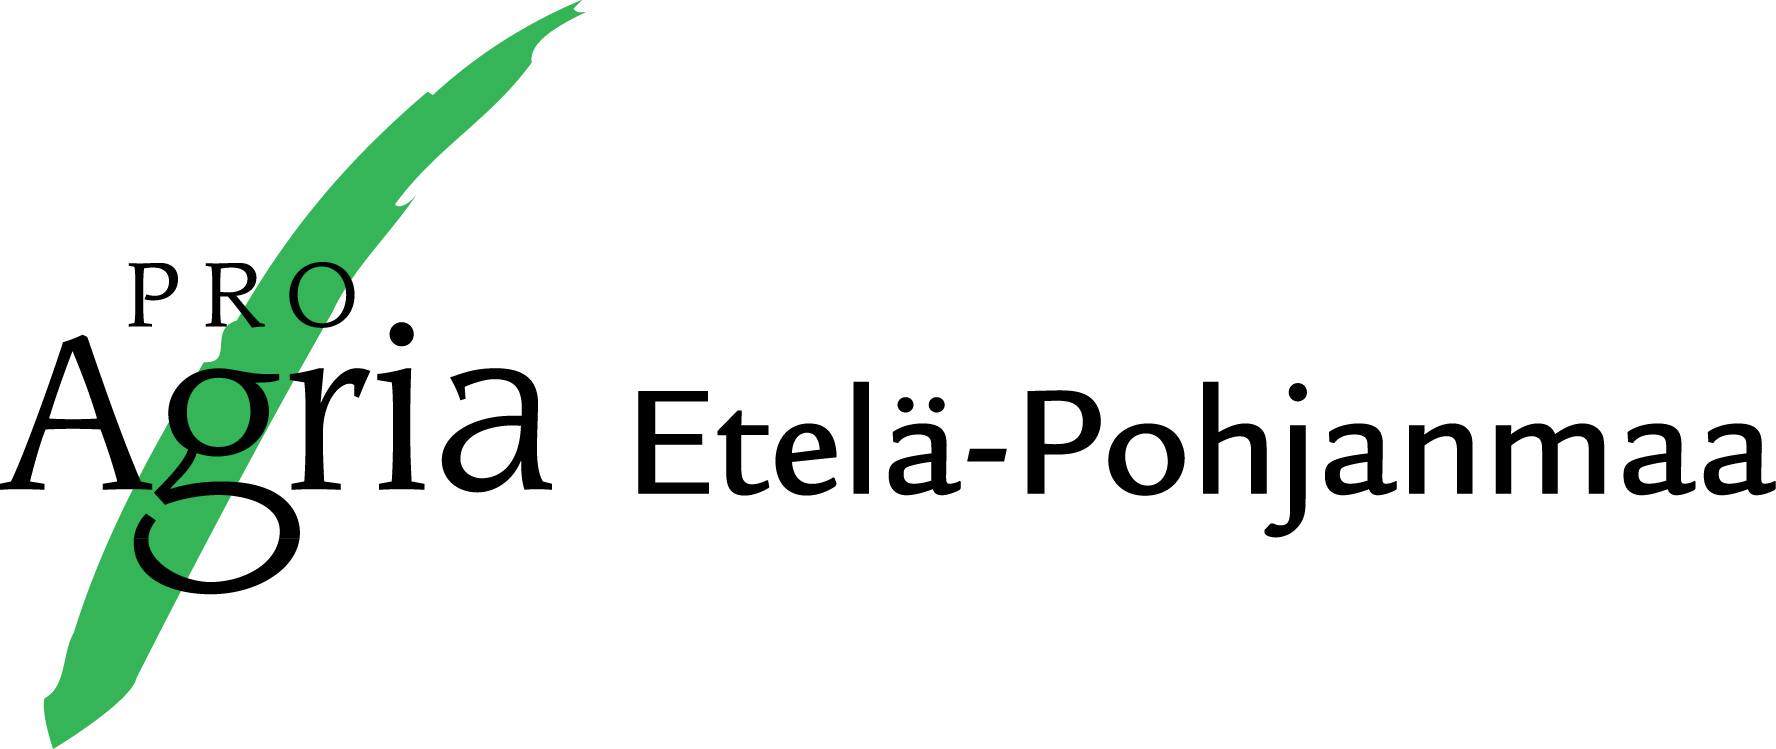 proagria_etela-pohjanmaargb.jpg (141 KB)